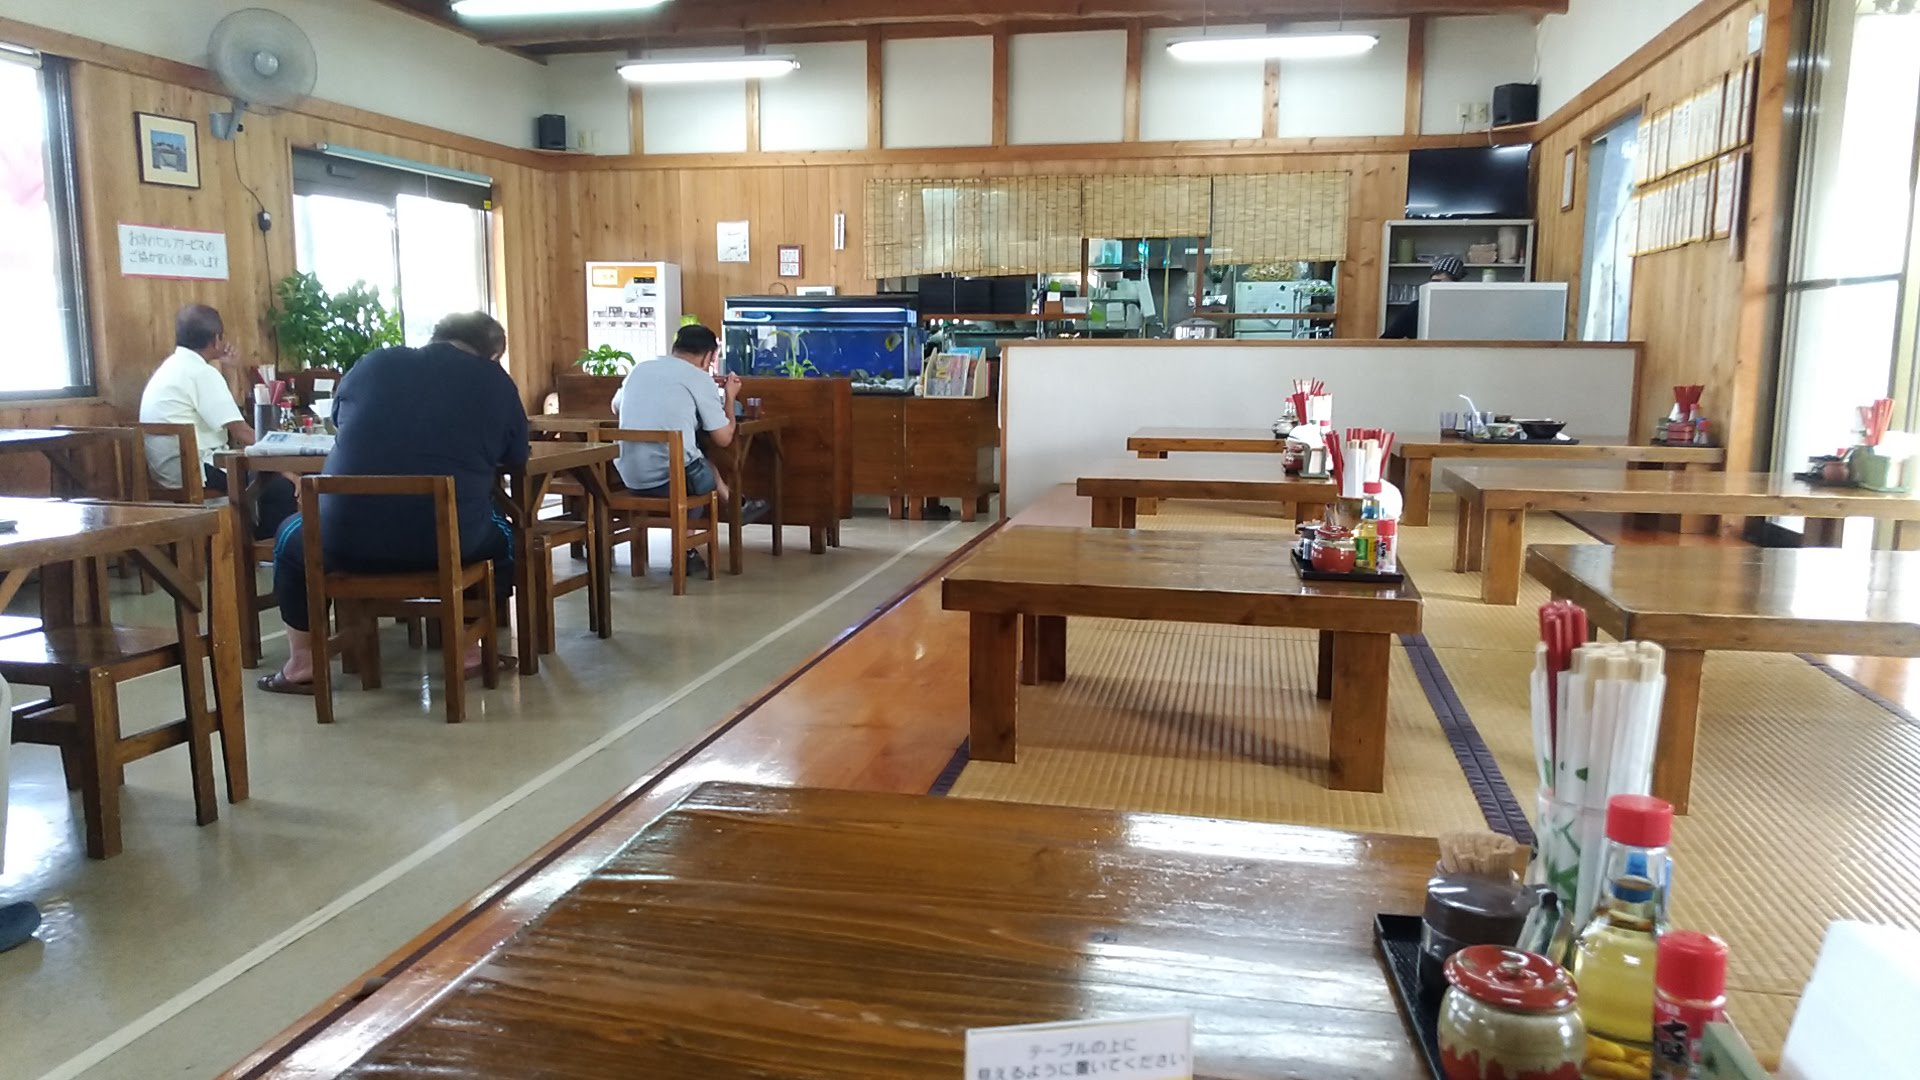 The inside of the Iibaruya